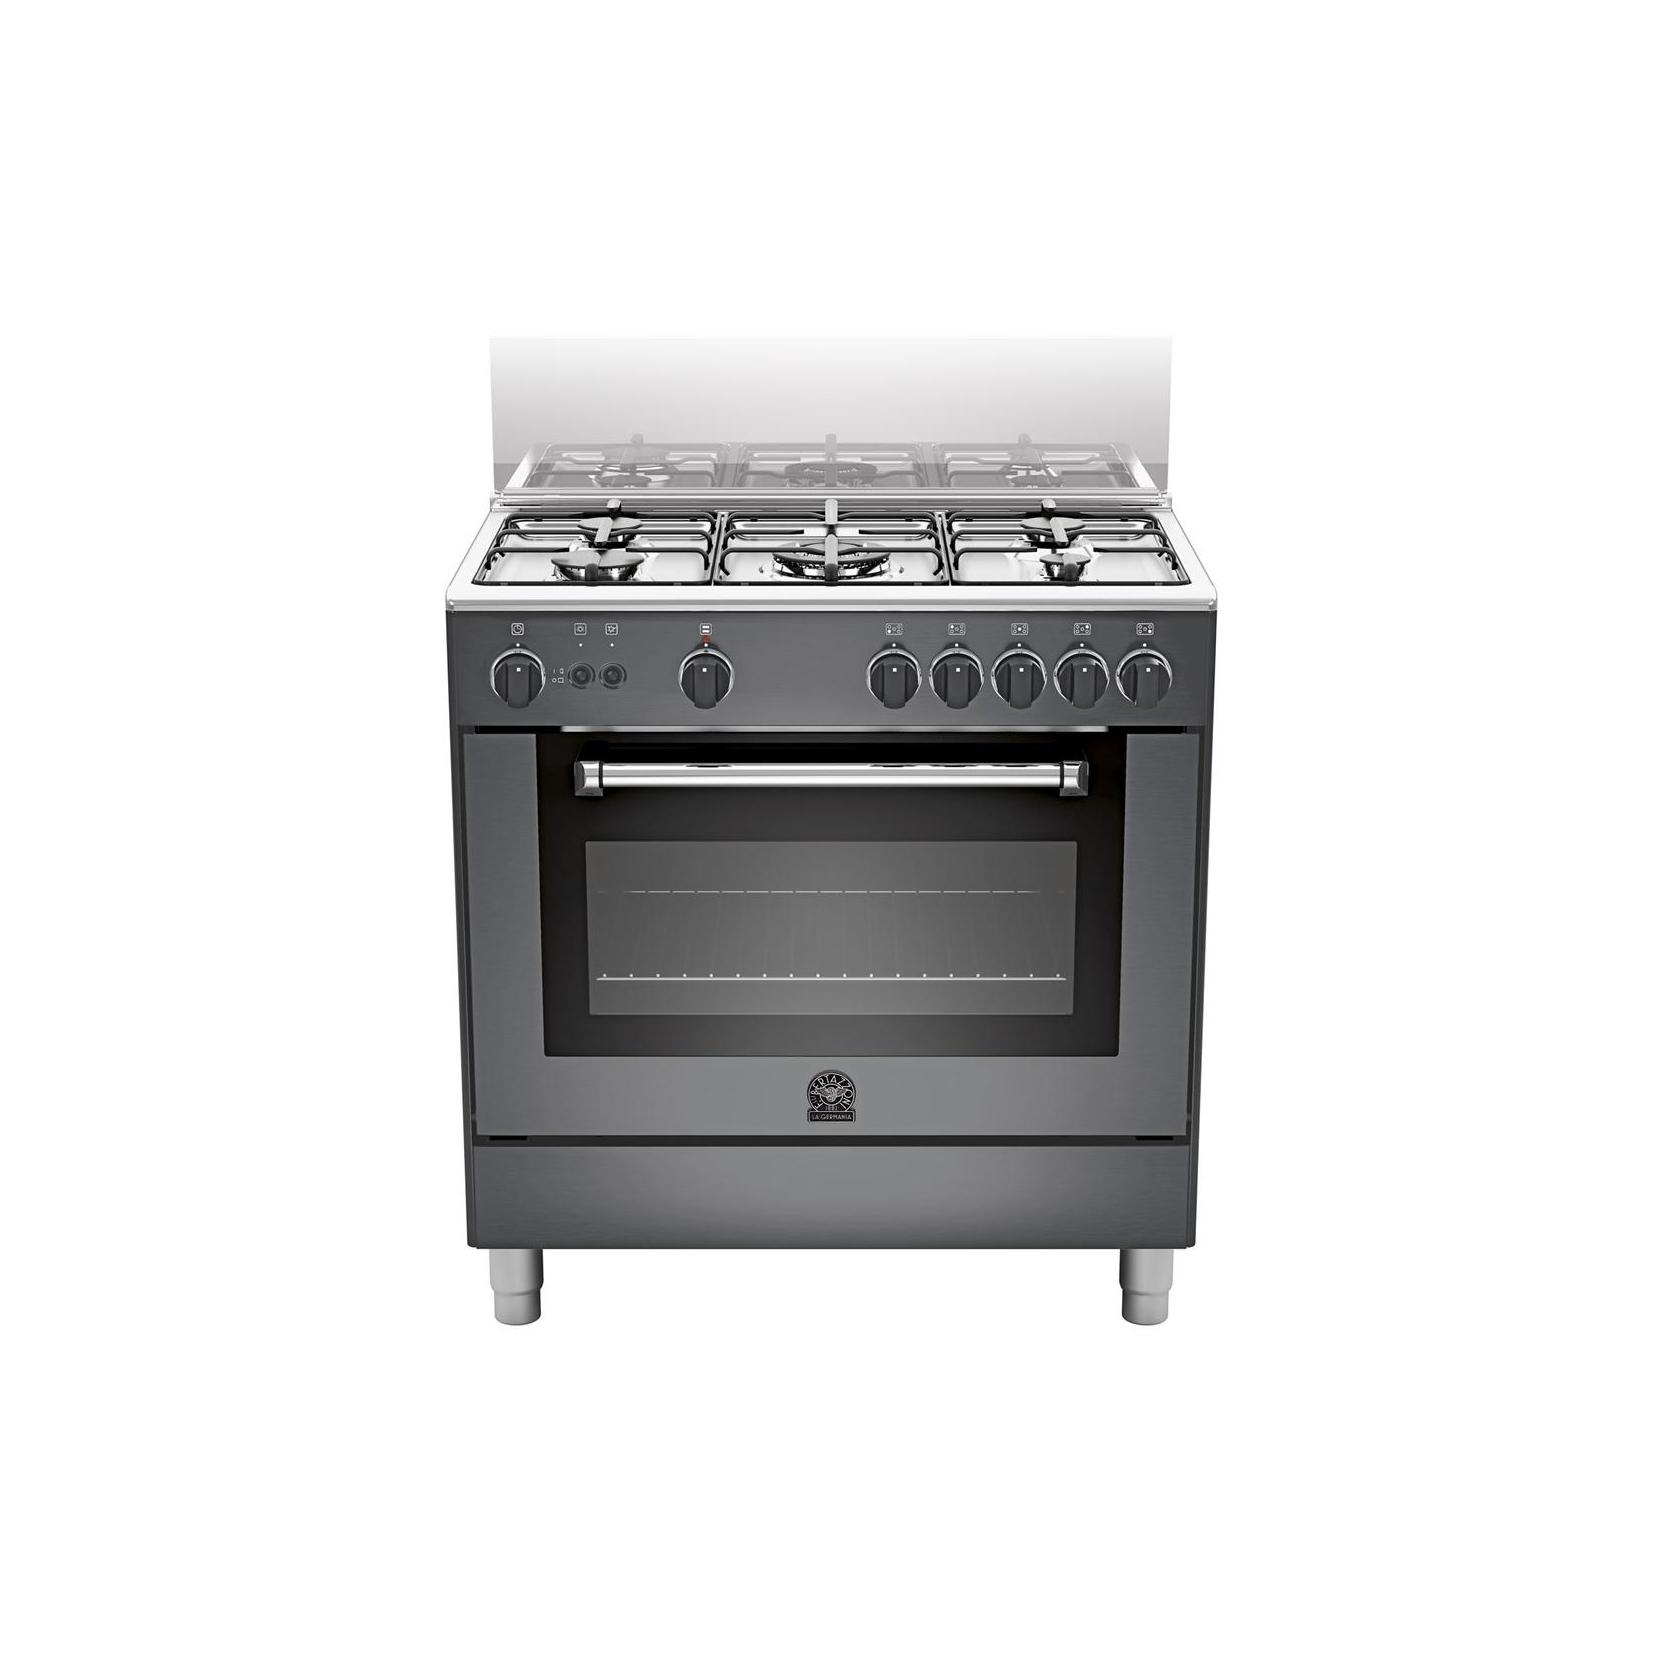 Cucina a gas la germania am85c71cne 13 5 fuochi a gas for Cucina 5 fuochi 70x60